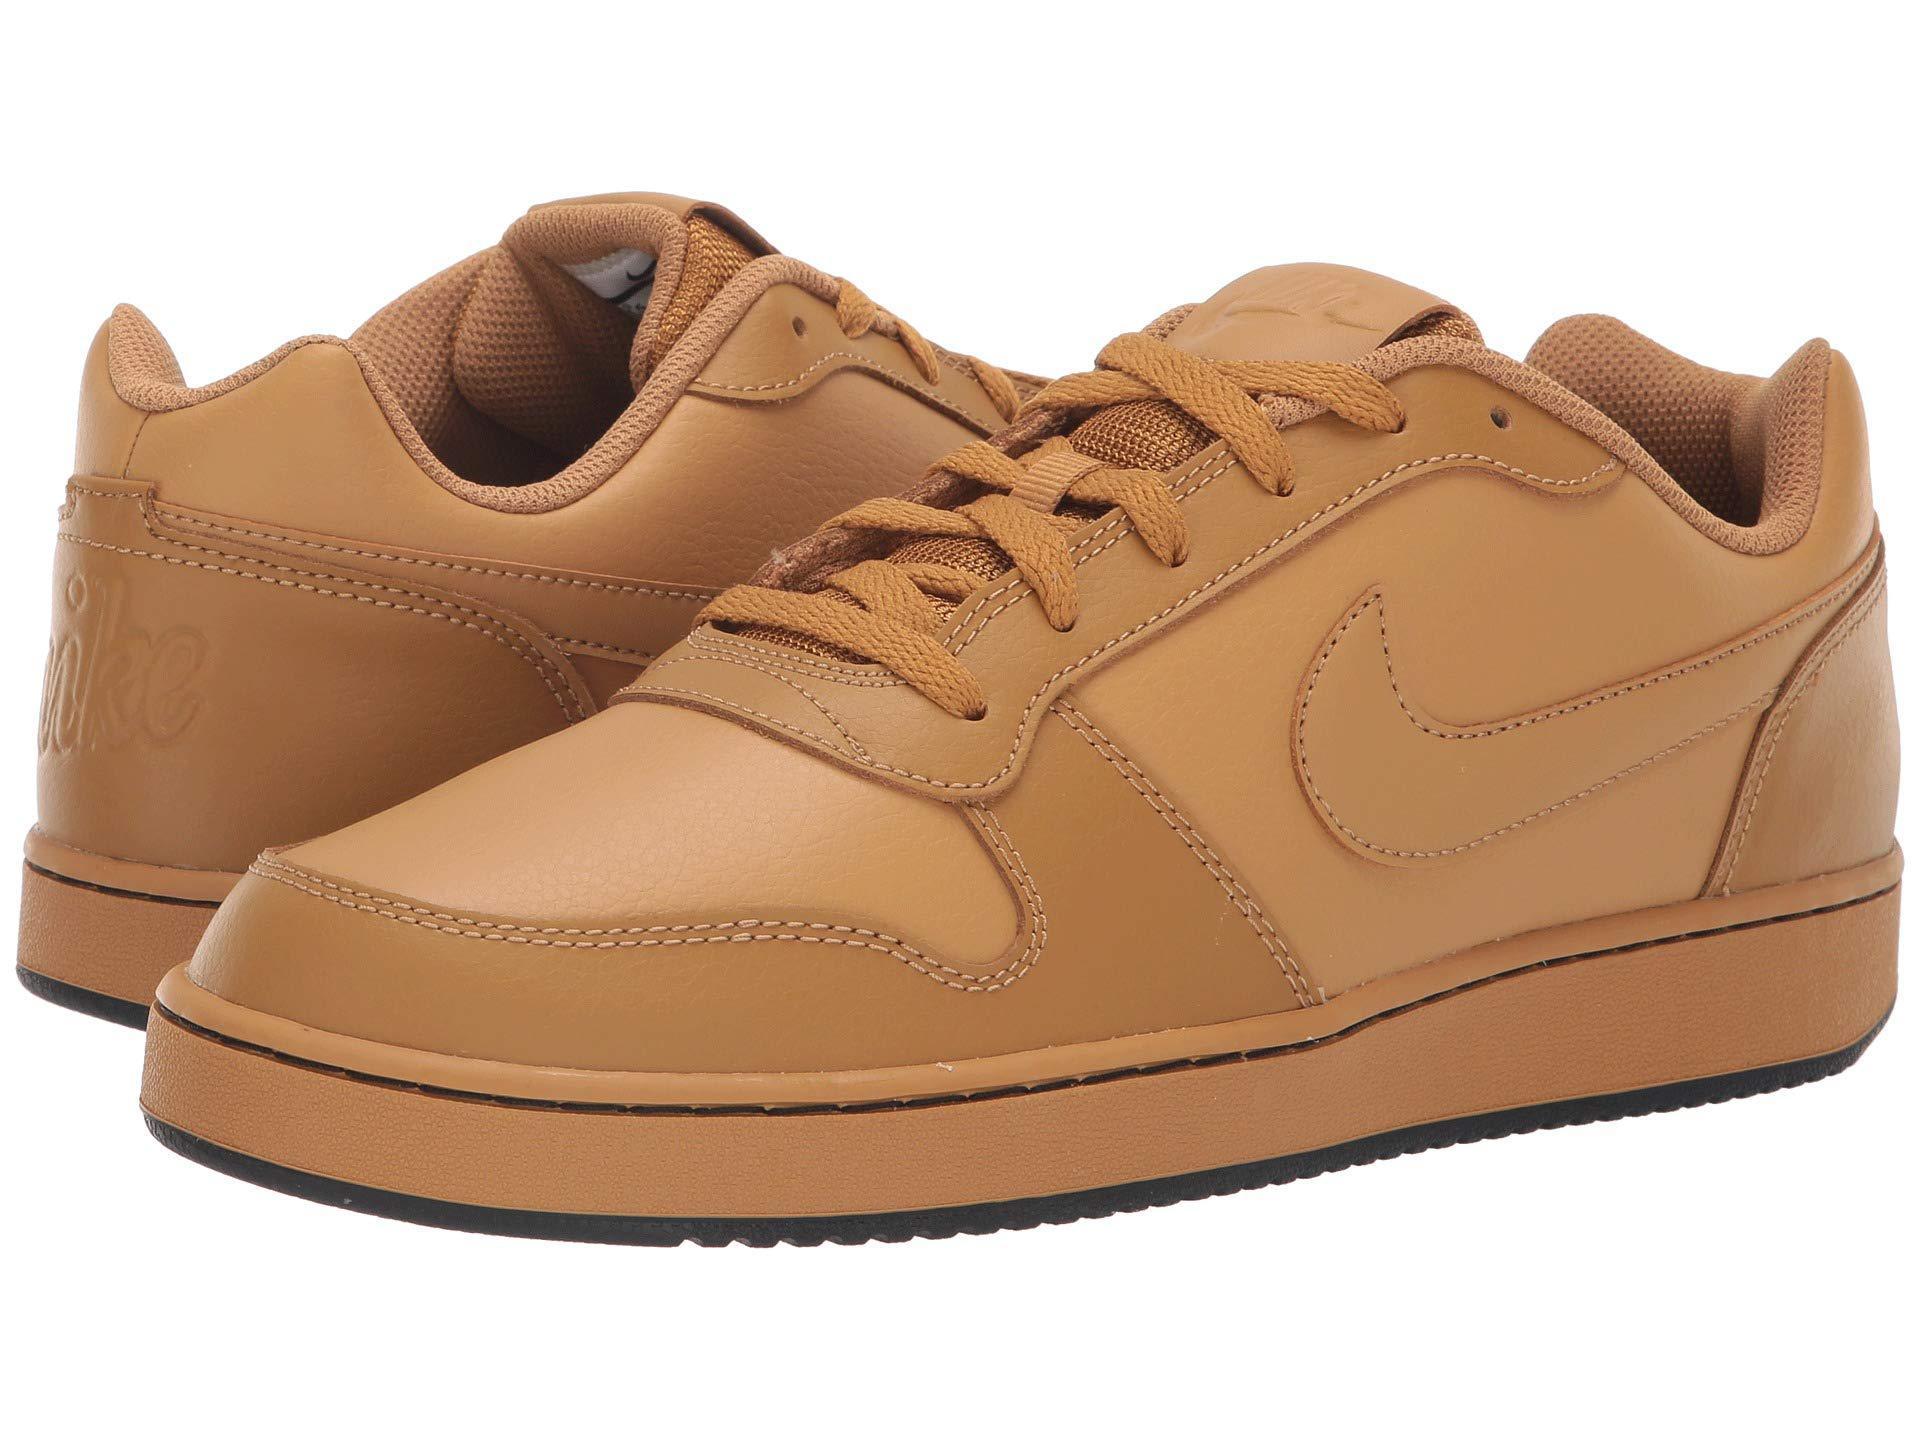 0acef26bc3 Lyst - Nike Ebernon Low (black white) Men s Shoes in Gray for Men